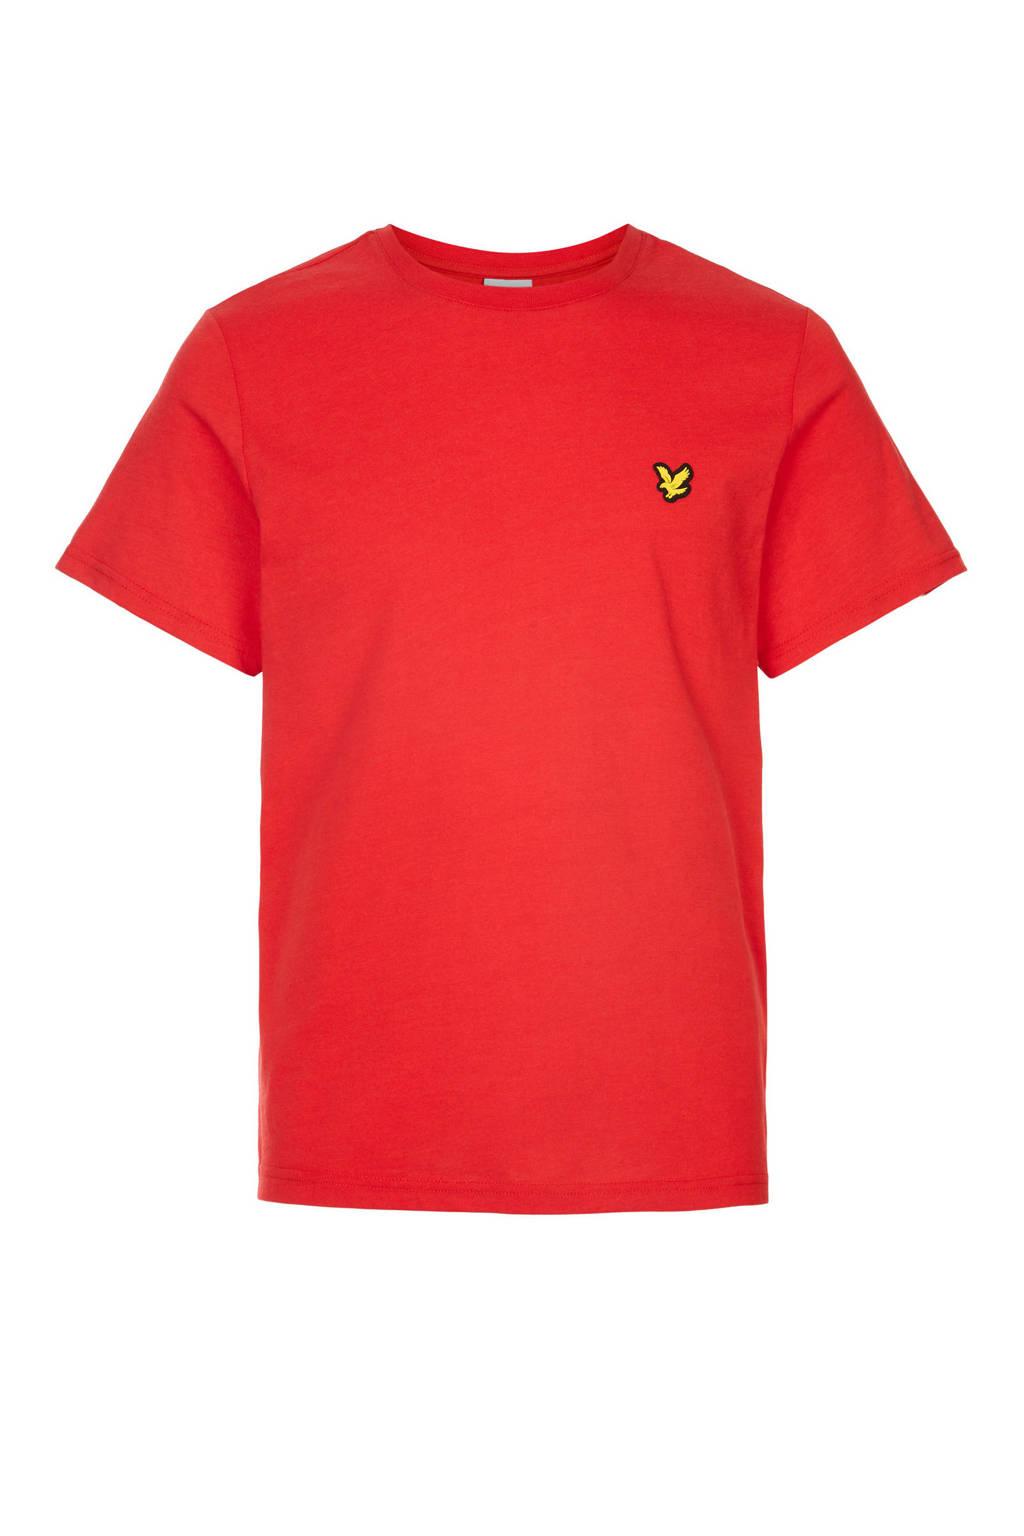 Lyle & Scott T-shirt rood, Rood